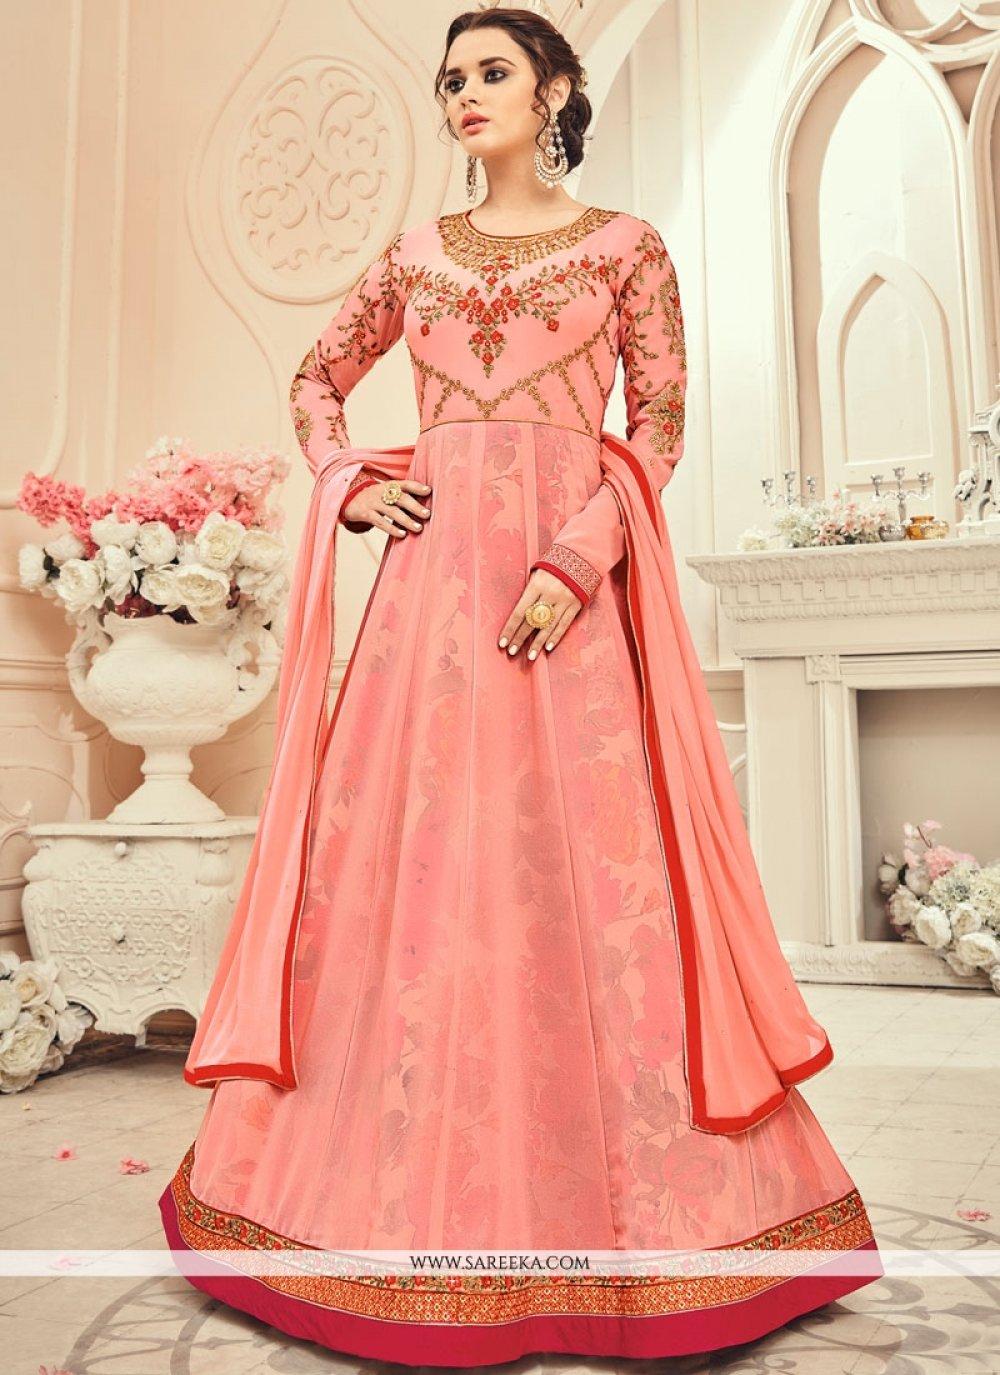 Resham Work Faux Georgette Pink Floor Length Anarkali Suit